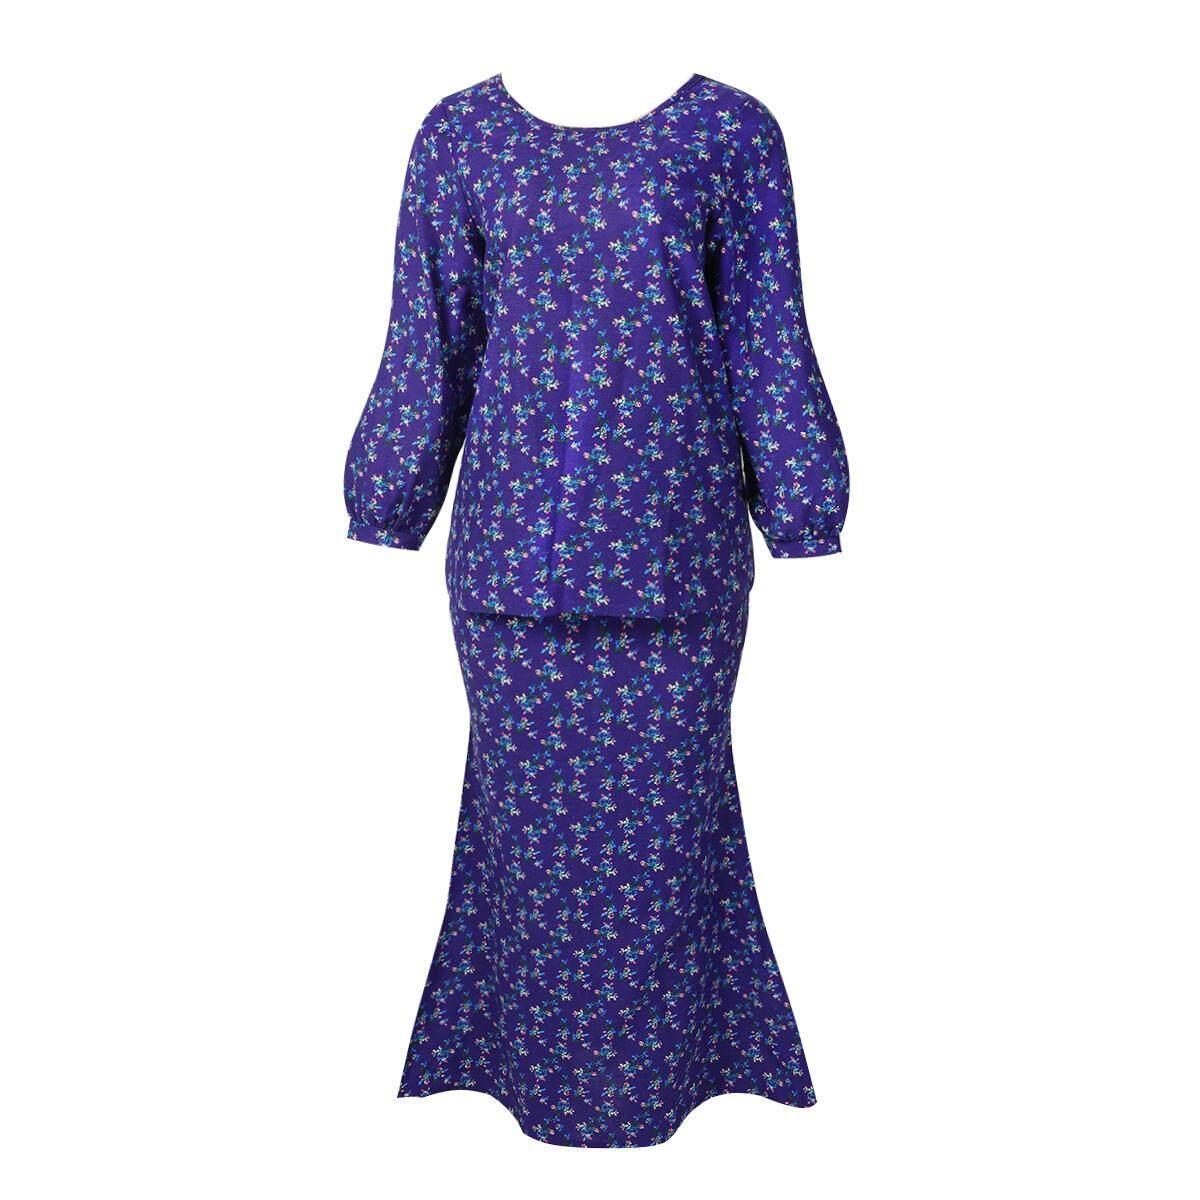 The Lowest Price For Laz 2019 Brand New Matwsec Modern Dress Muslim Set Baju Plus Size Blue Linen Kebaya Women Raya Fashion Exclusive Cotton